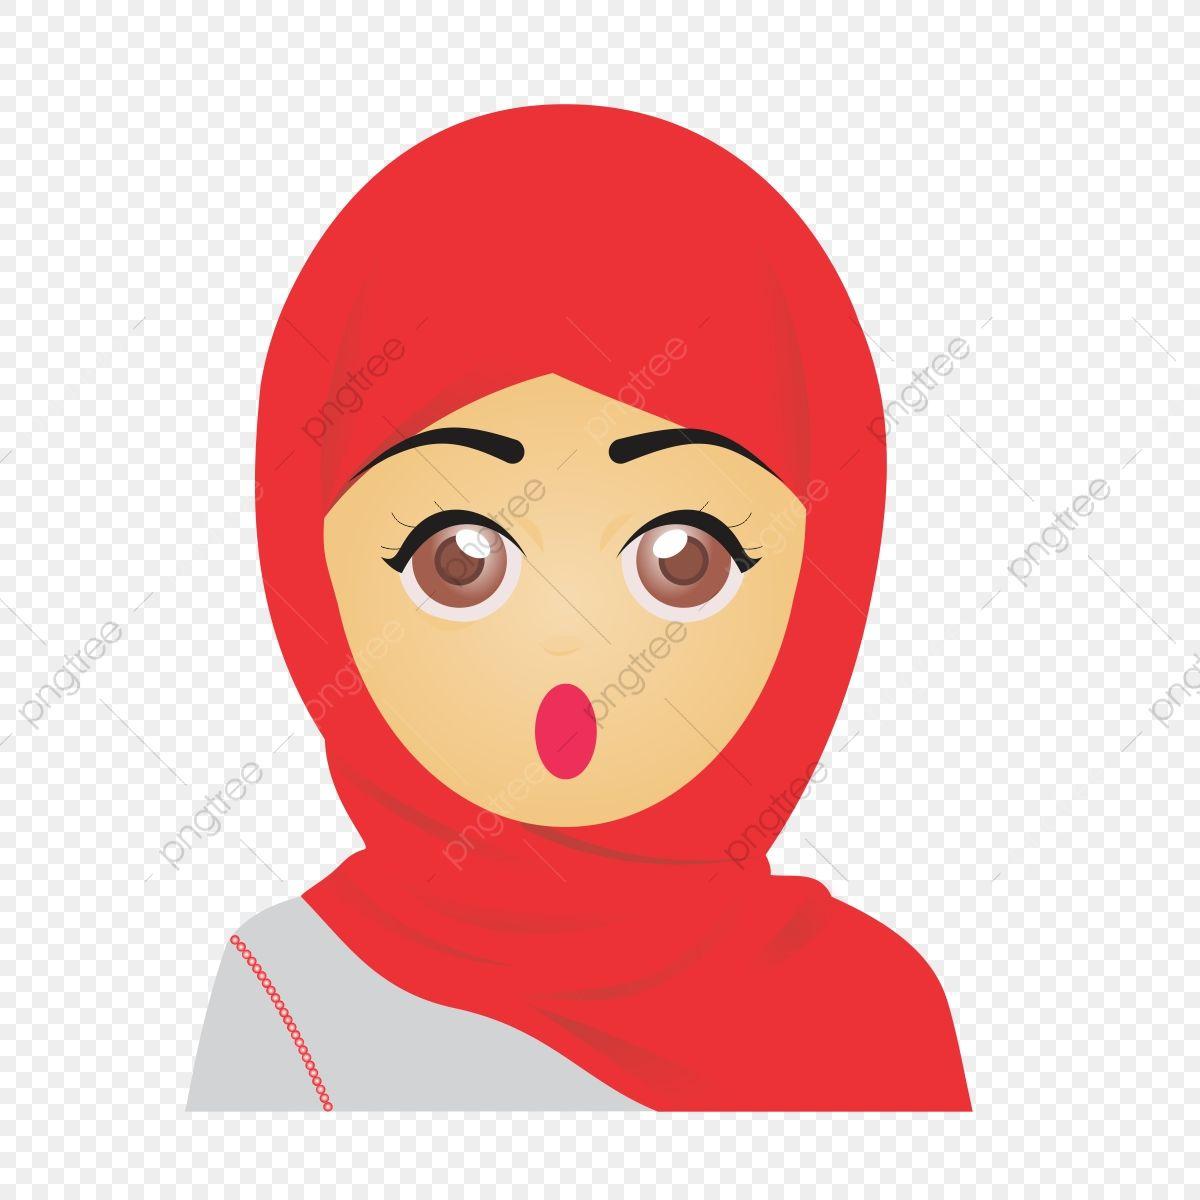 Muslim Set Cute Expressions Expression Express Muslim Png Transparent Image And Clipart For Free Download Muslim Emoji Cartoon Expression Emoji Set